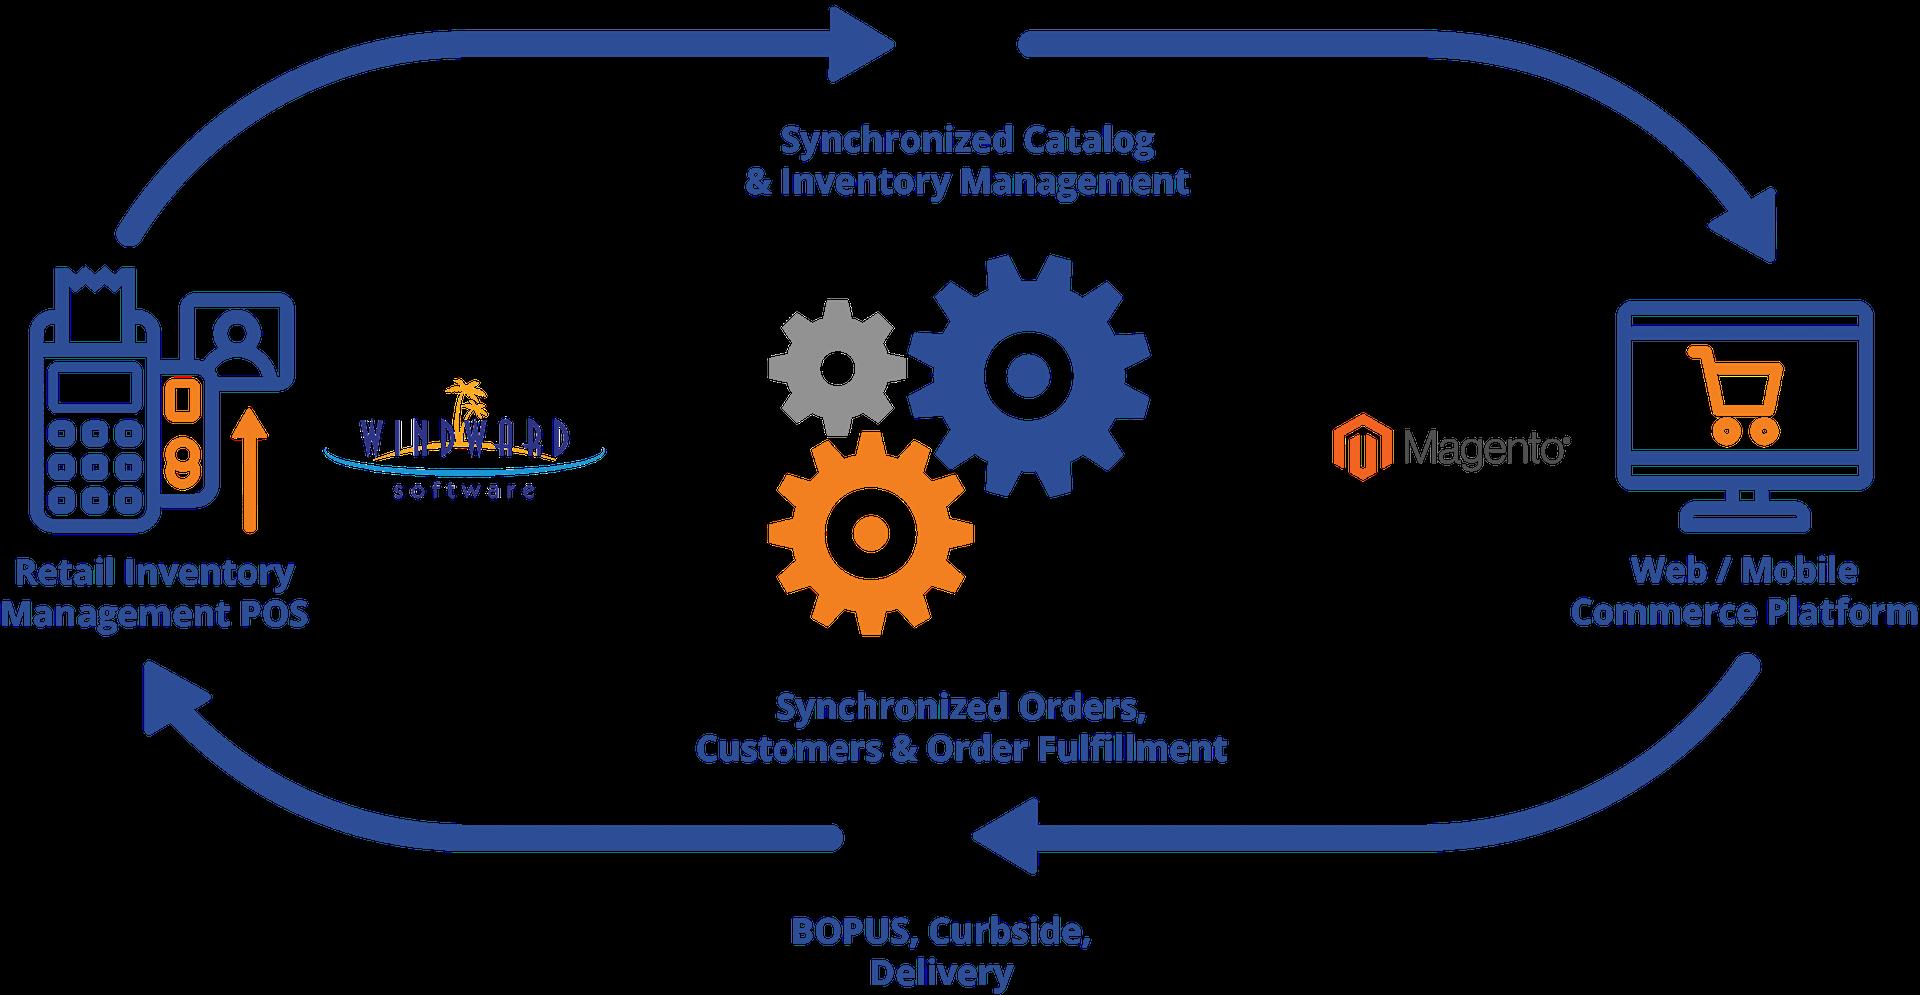 Windward To Magento Unified Commerce Engine